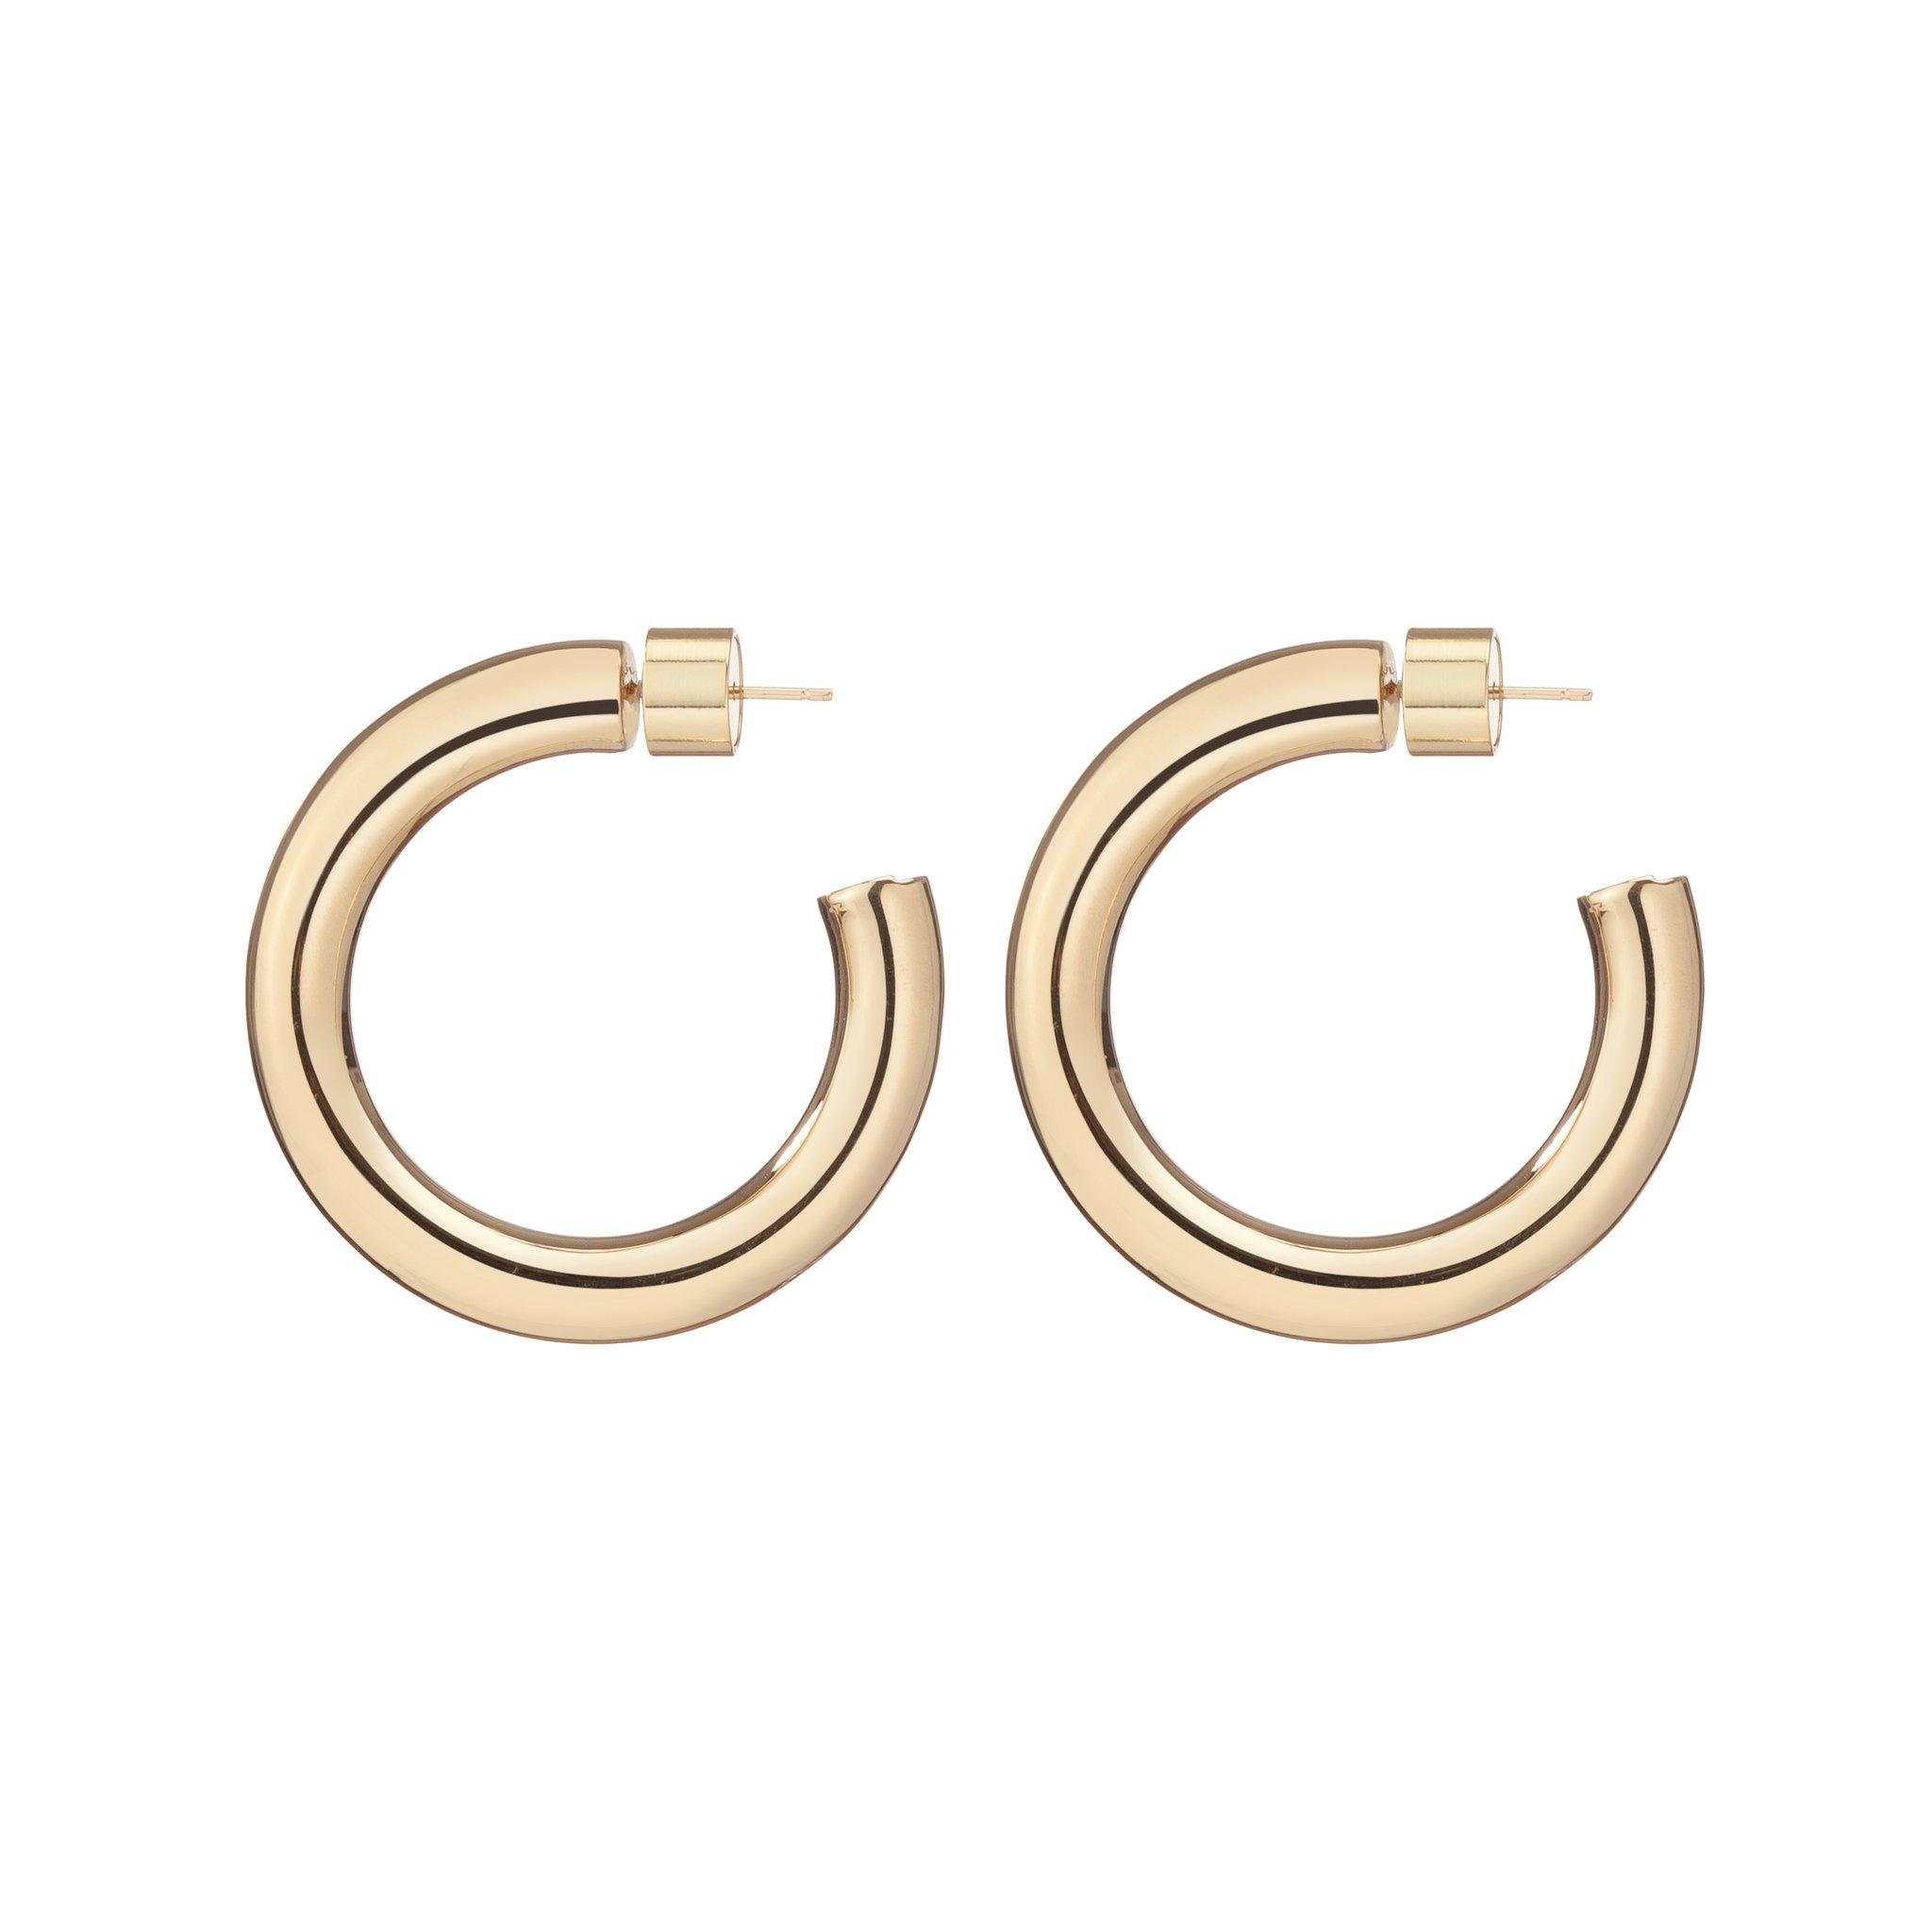 Mini Gold Samira Hoop Earrings by Jennifer Fisher, available on jenniferfisherjewelry.com for $295 Selena Gomez Jewellery Exact Product